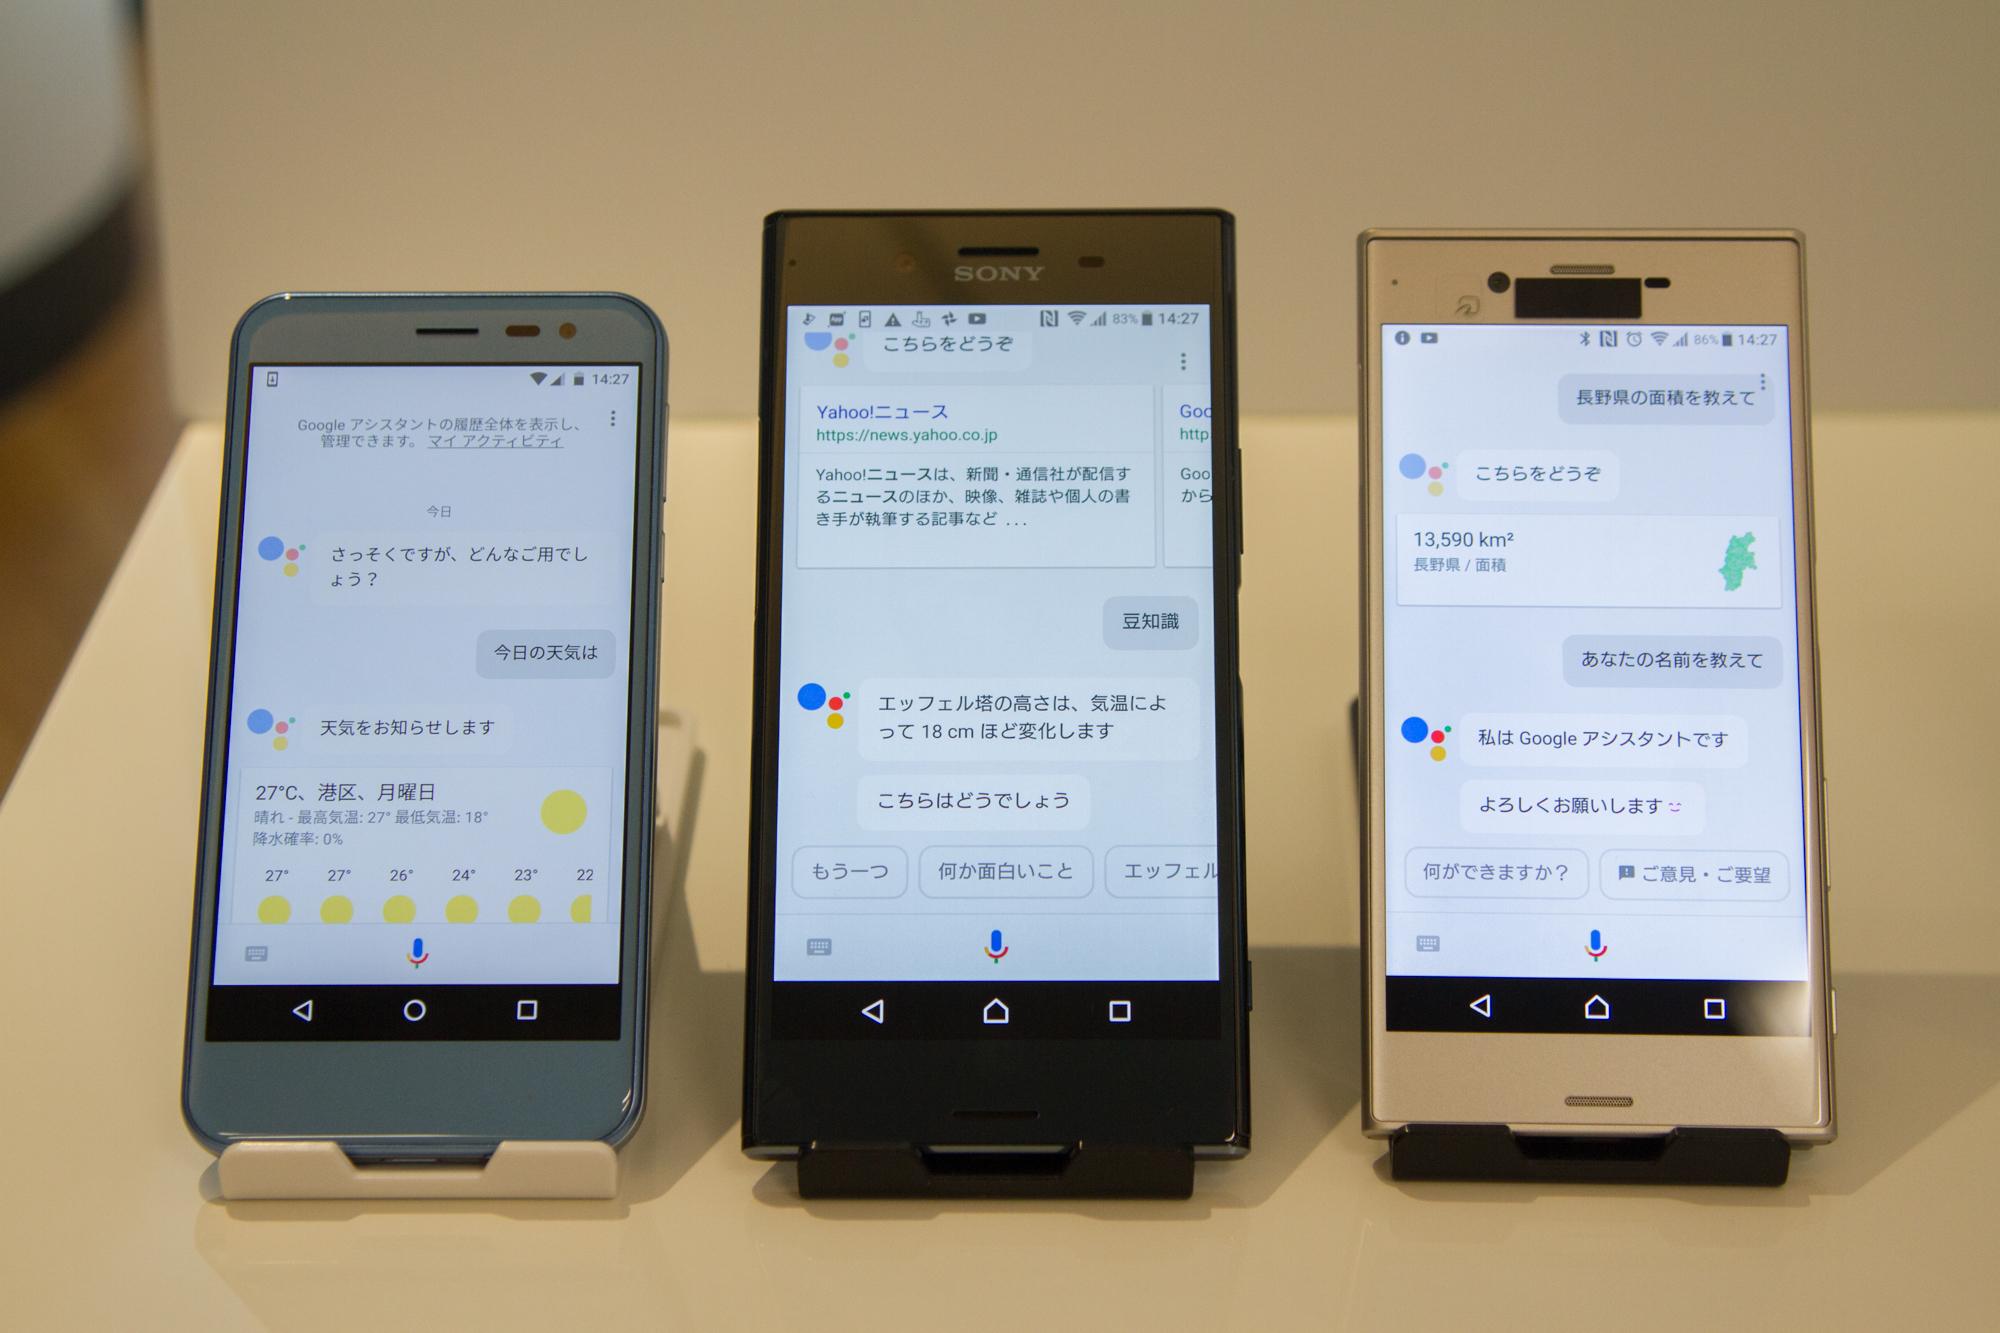 Google アシスタント 日本語版 2